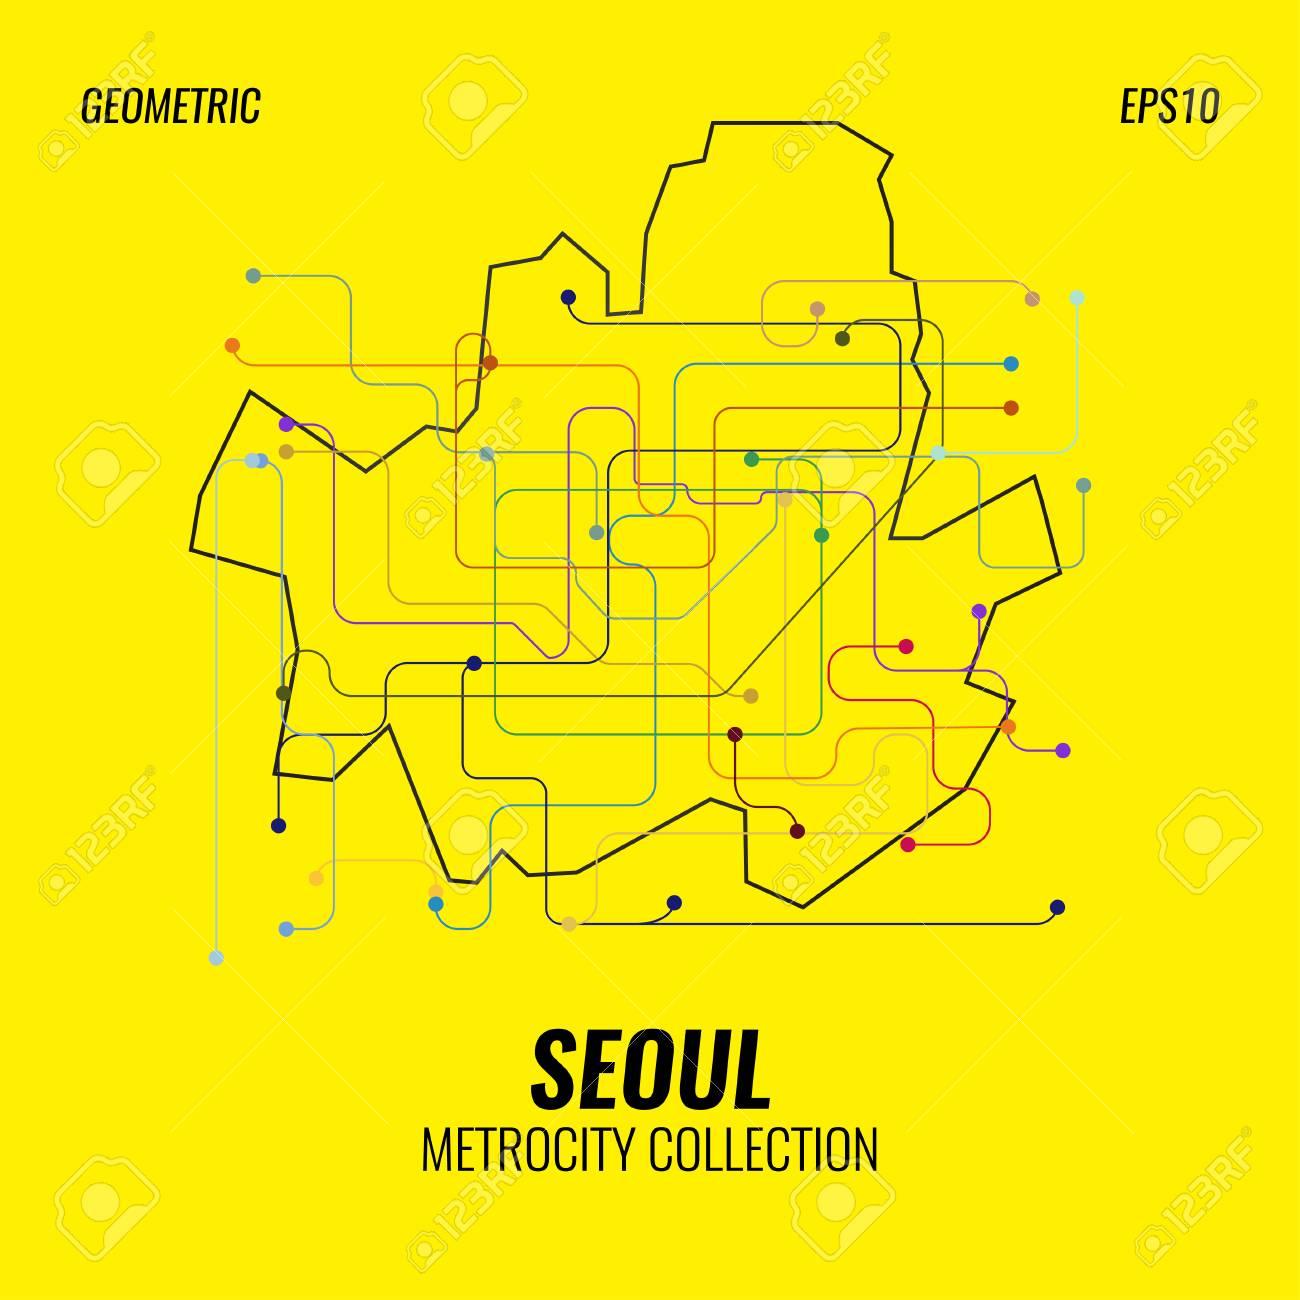 Seoul Metropolitan Subway Map Download.Seoul Metro Map City Subway Graphic Vector Abstract Poster